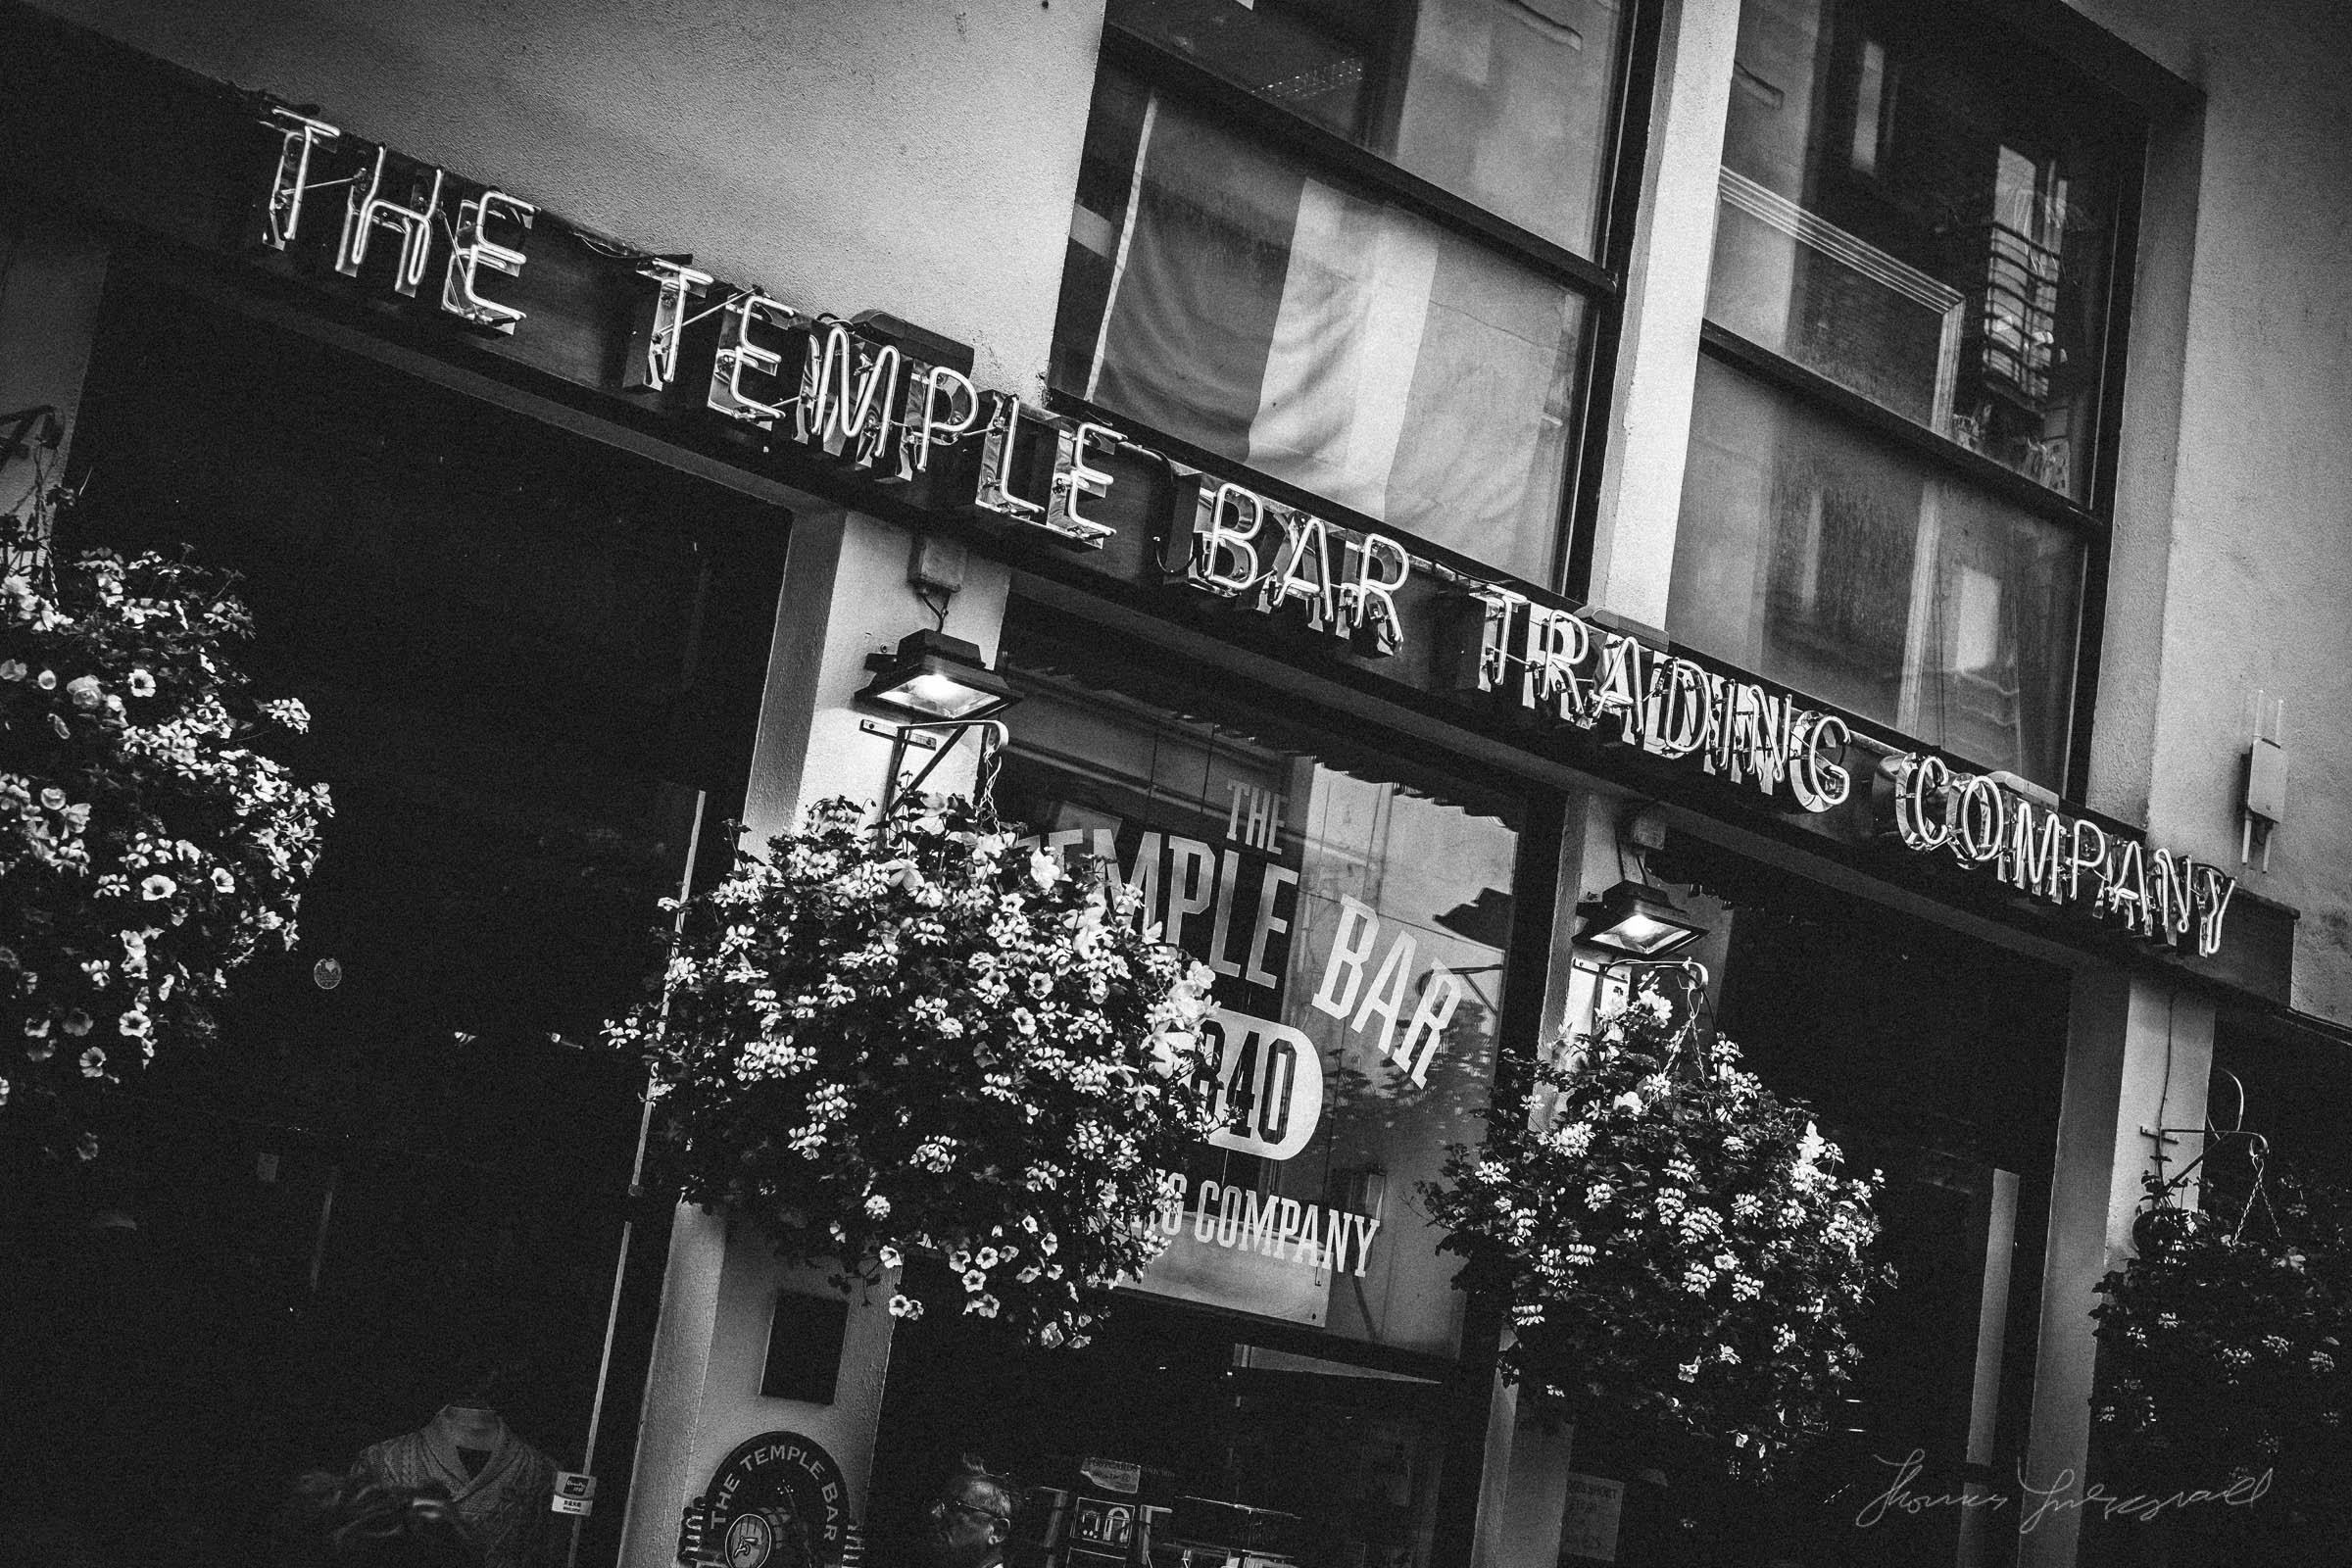 The Temple Bar Trading Company